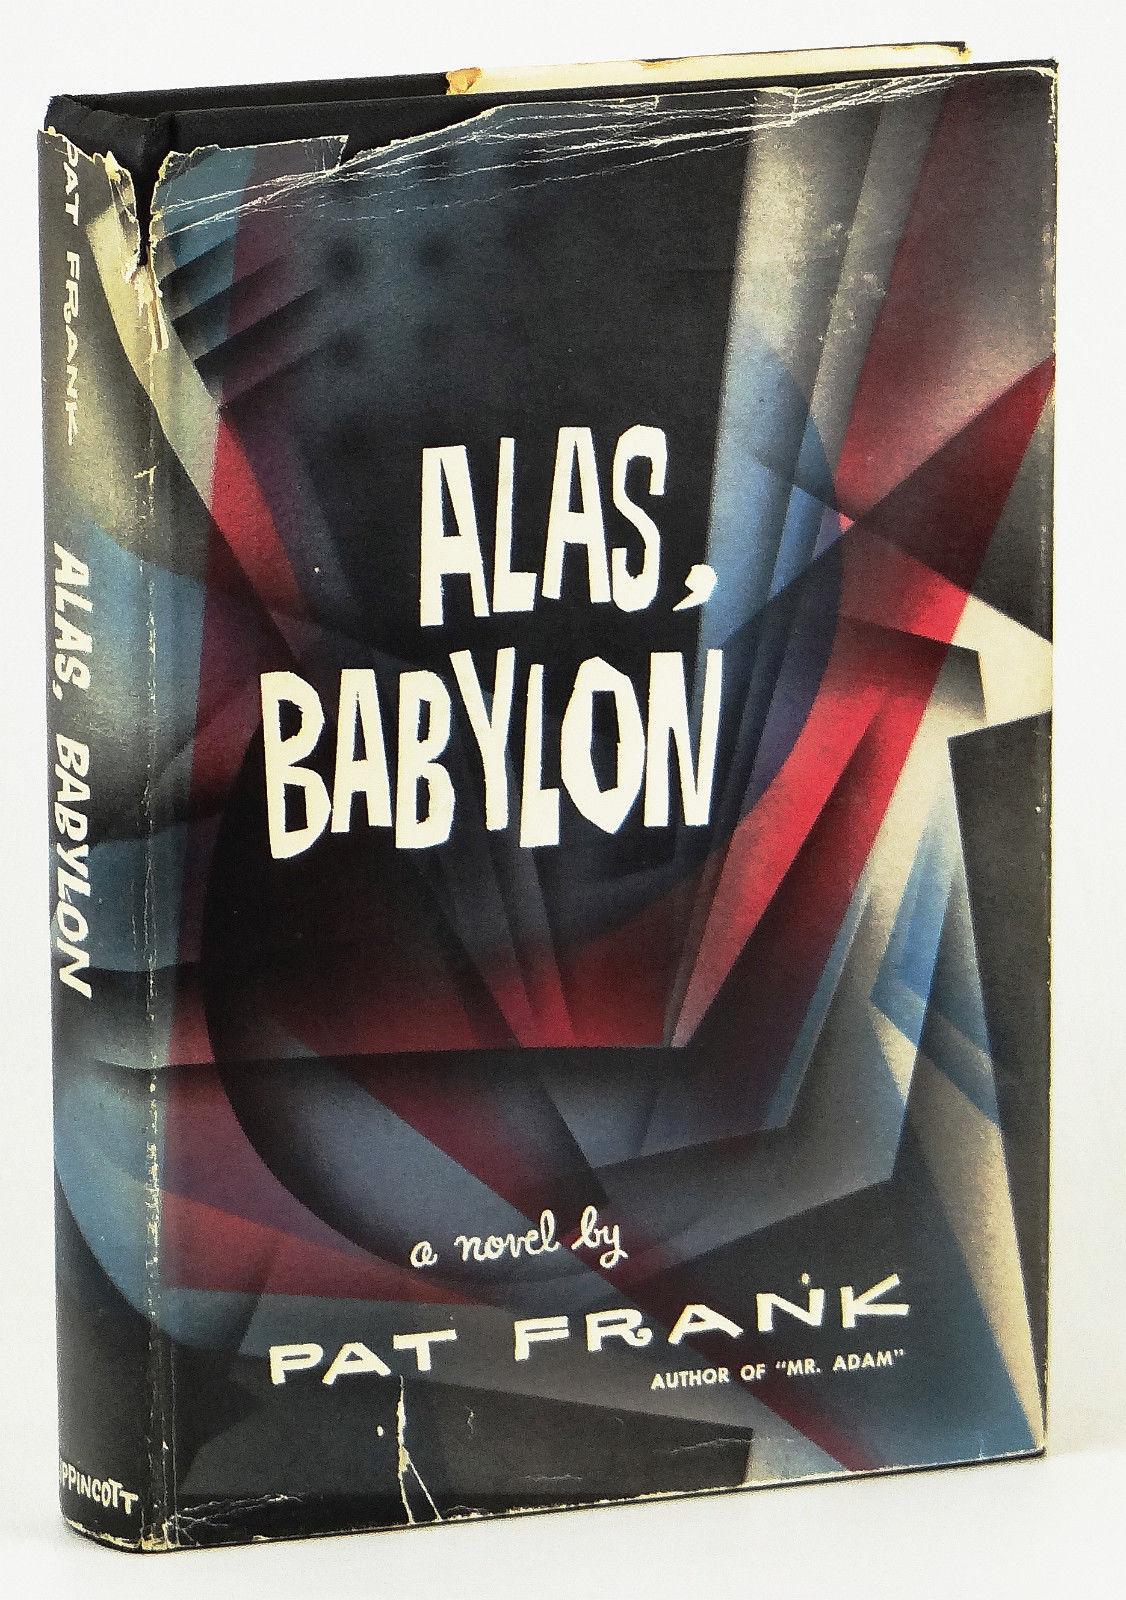 alas babylon essay Essays and criticism on pat frank's alas, babylon - critical essays.